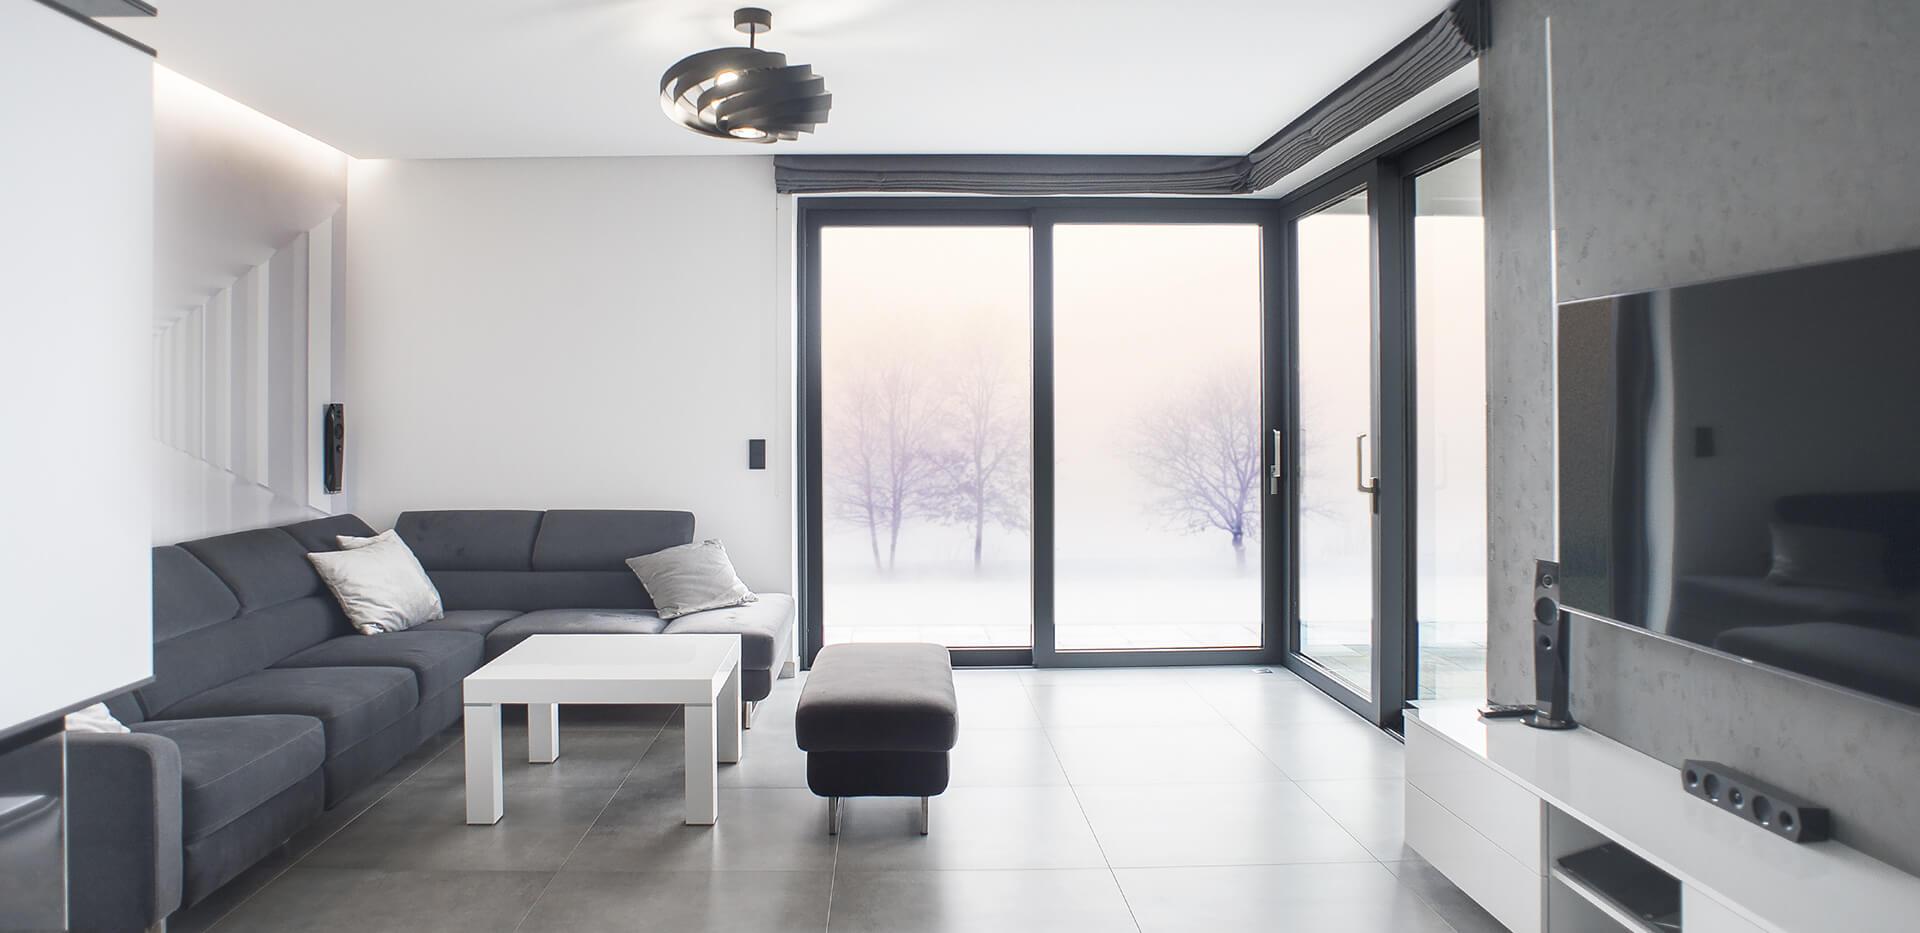 Okna, okno Wiśniowski. Adams Salon partnerski Żary